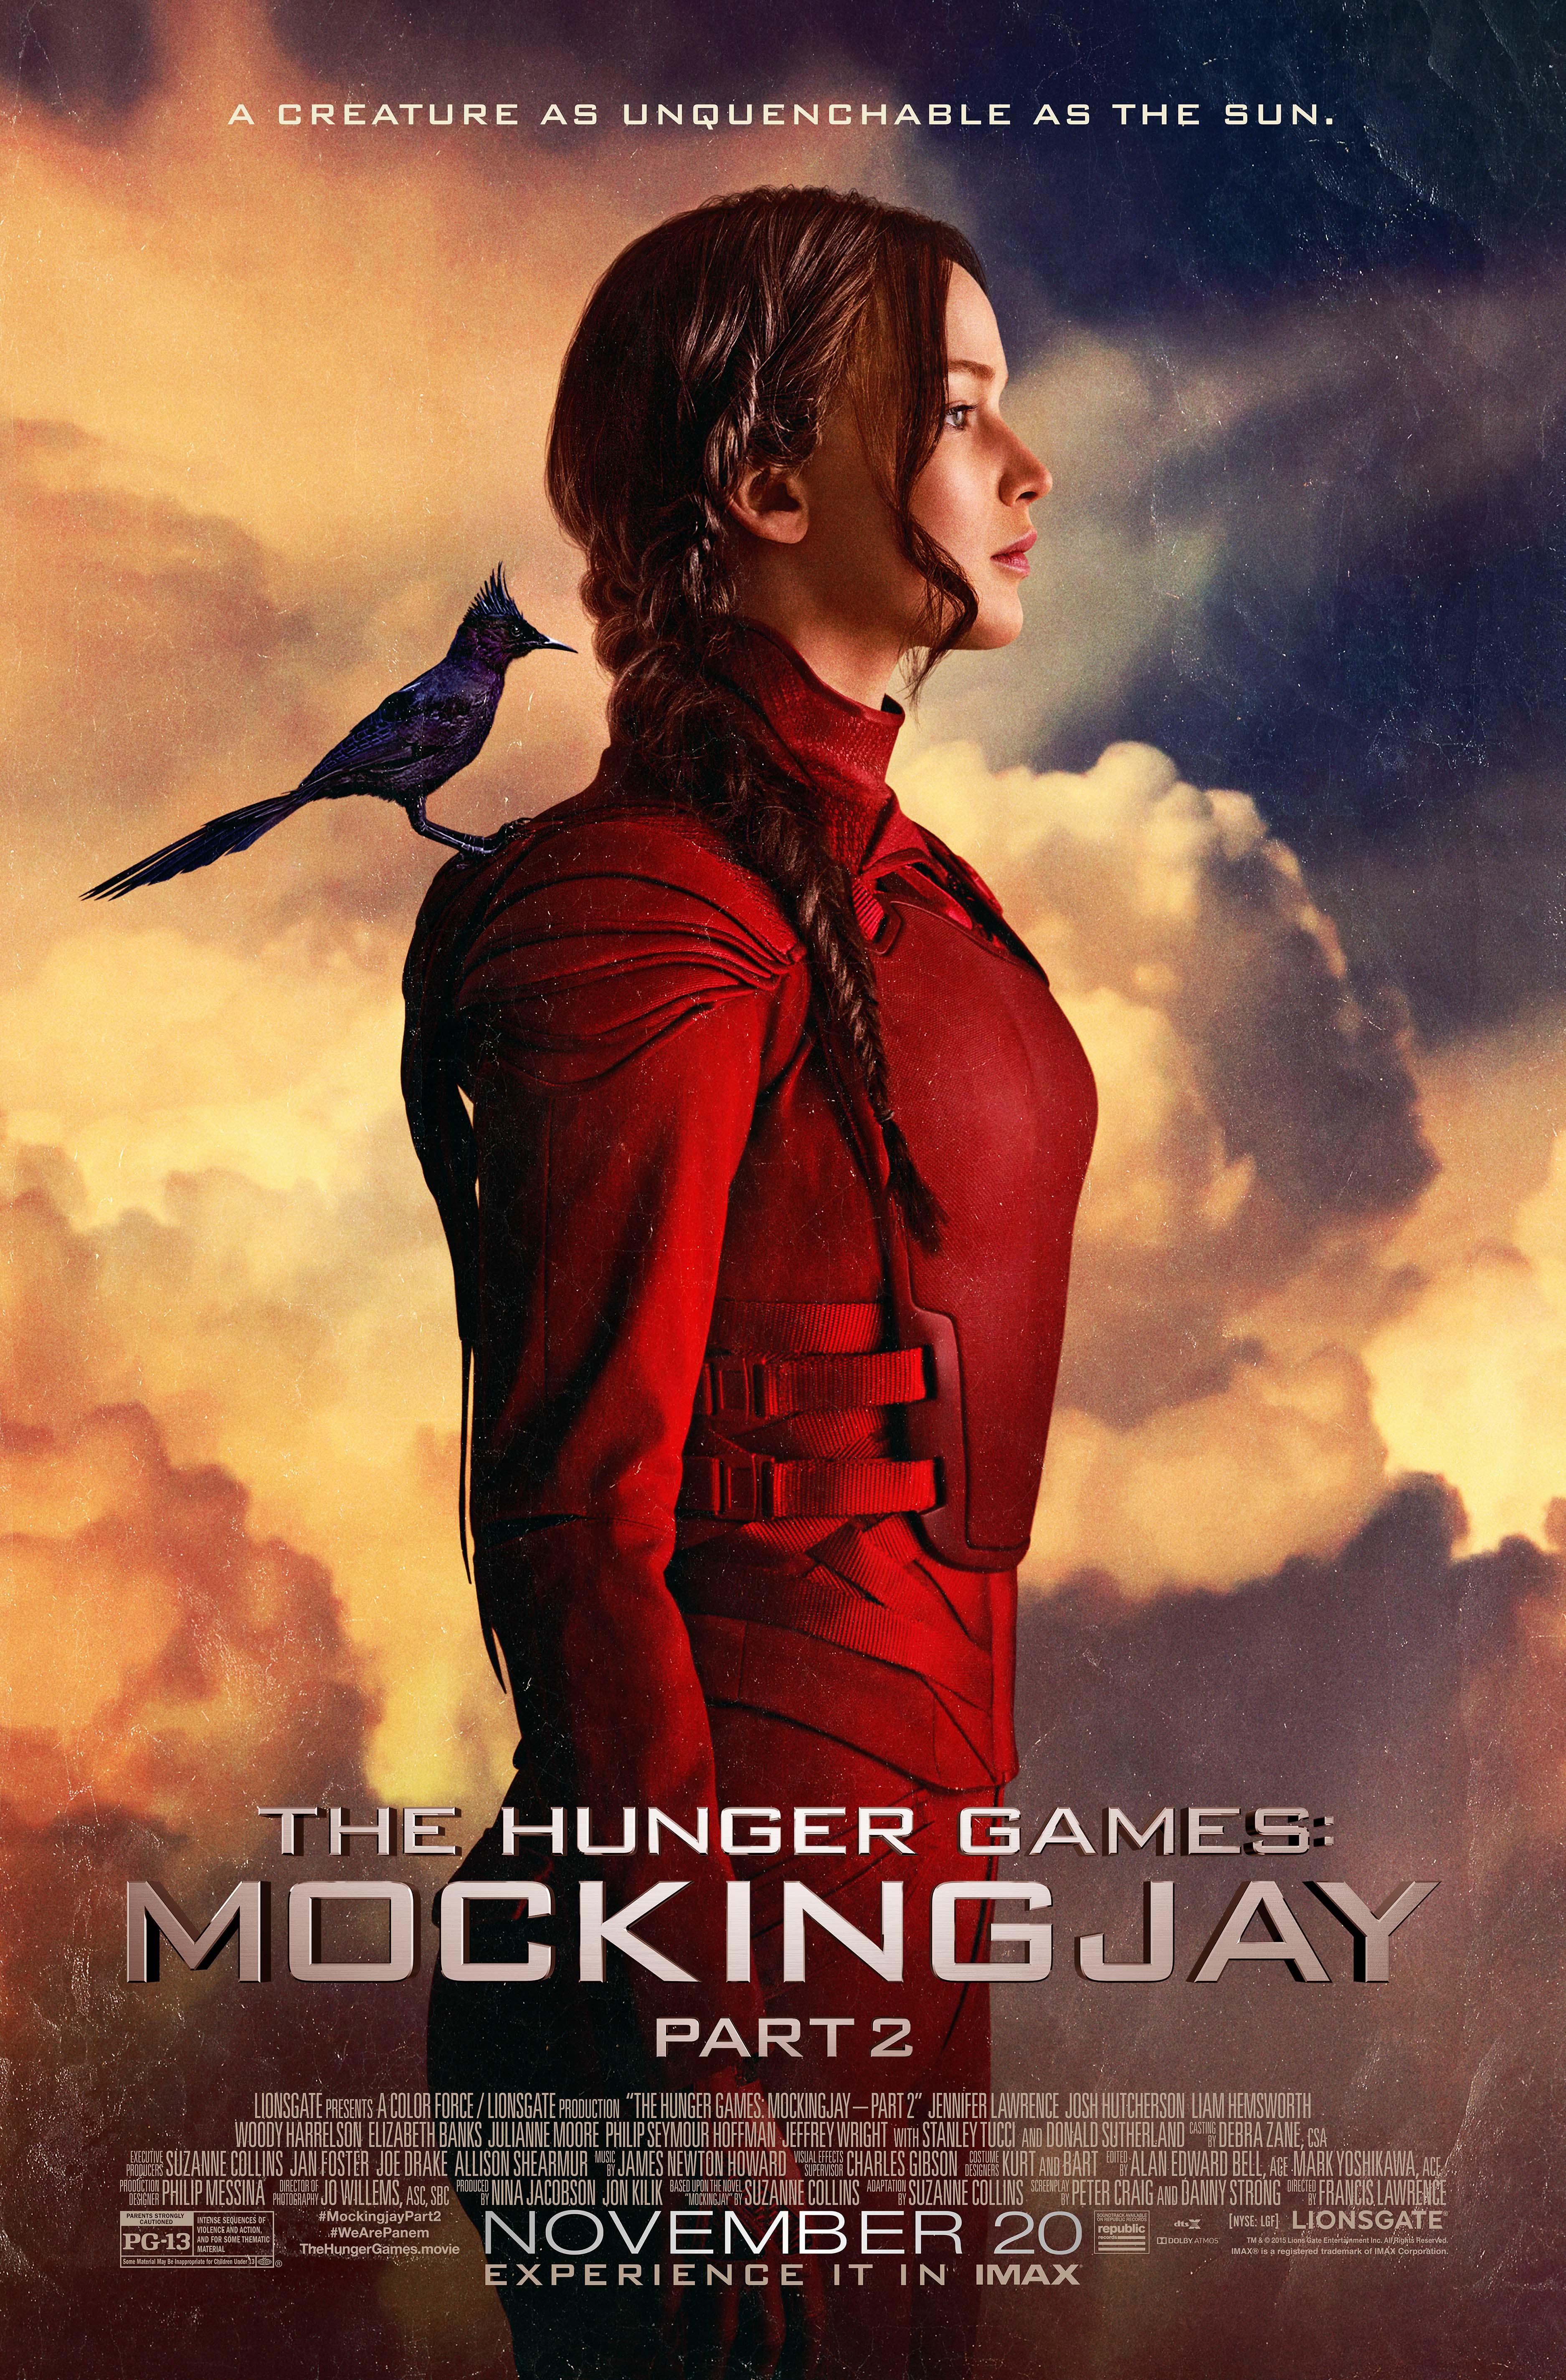 mockingjay part 2 full movie download mp4